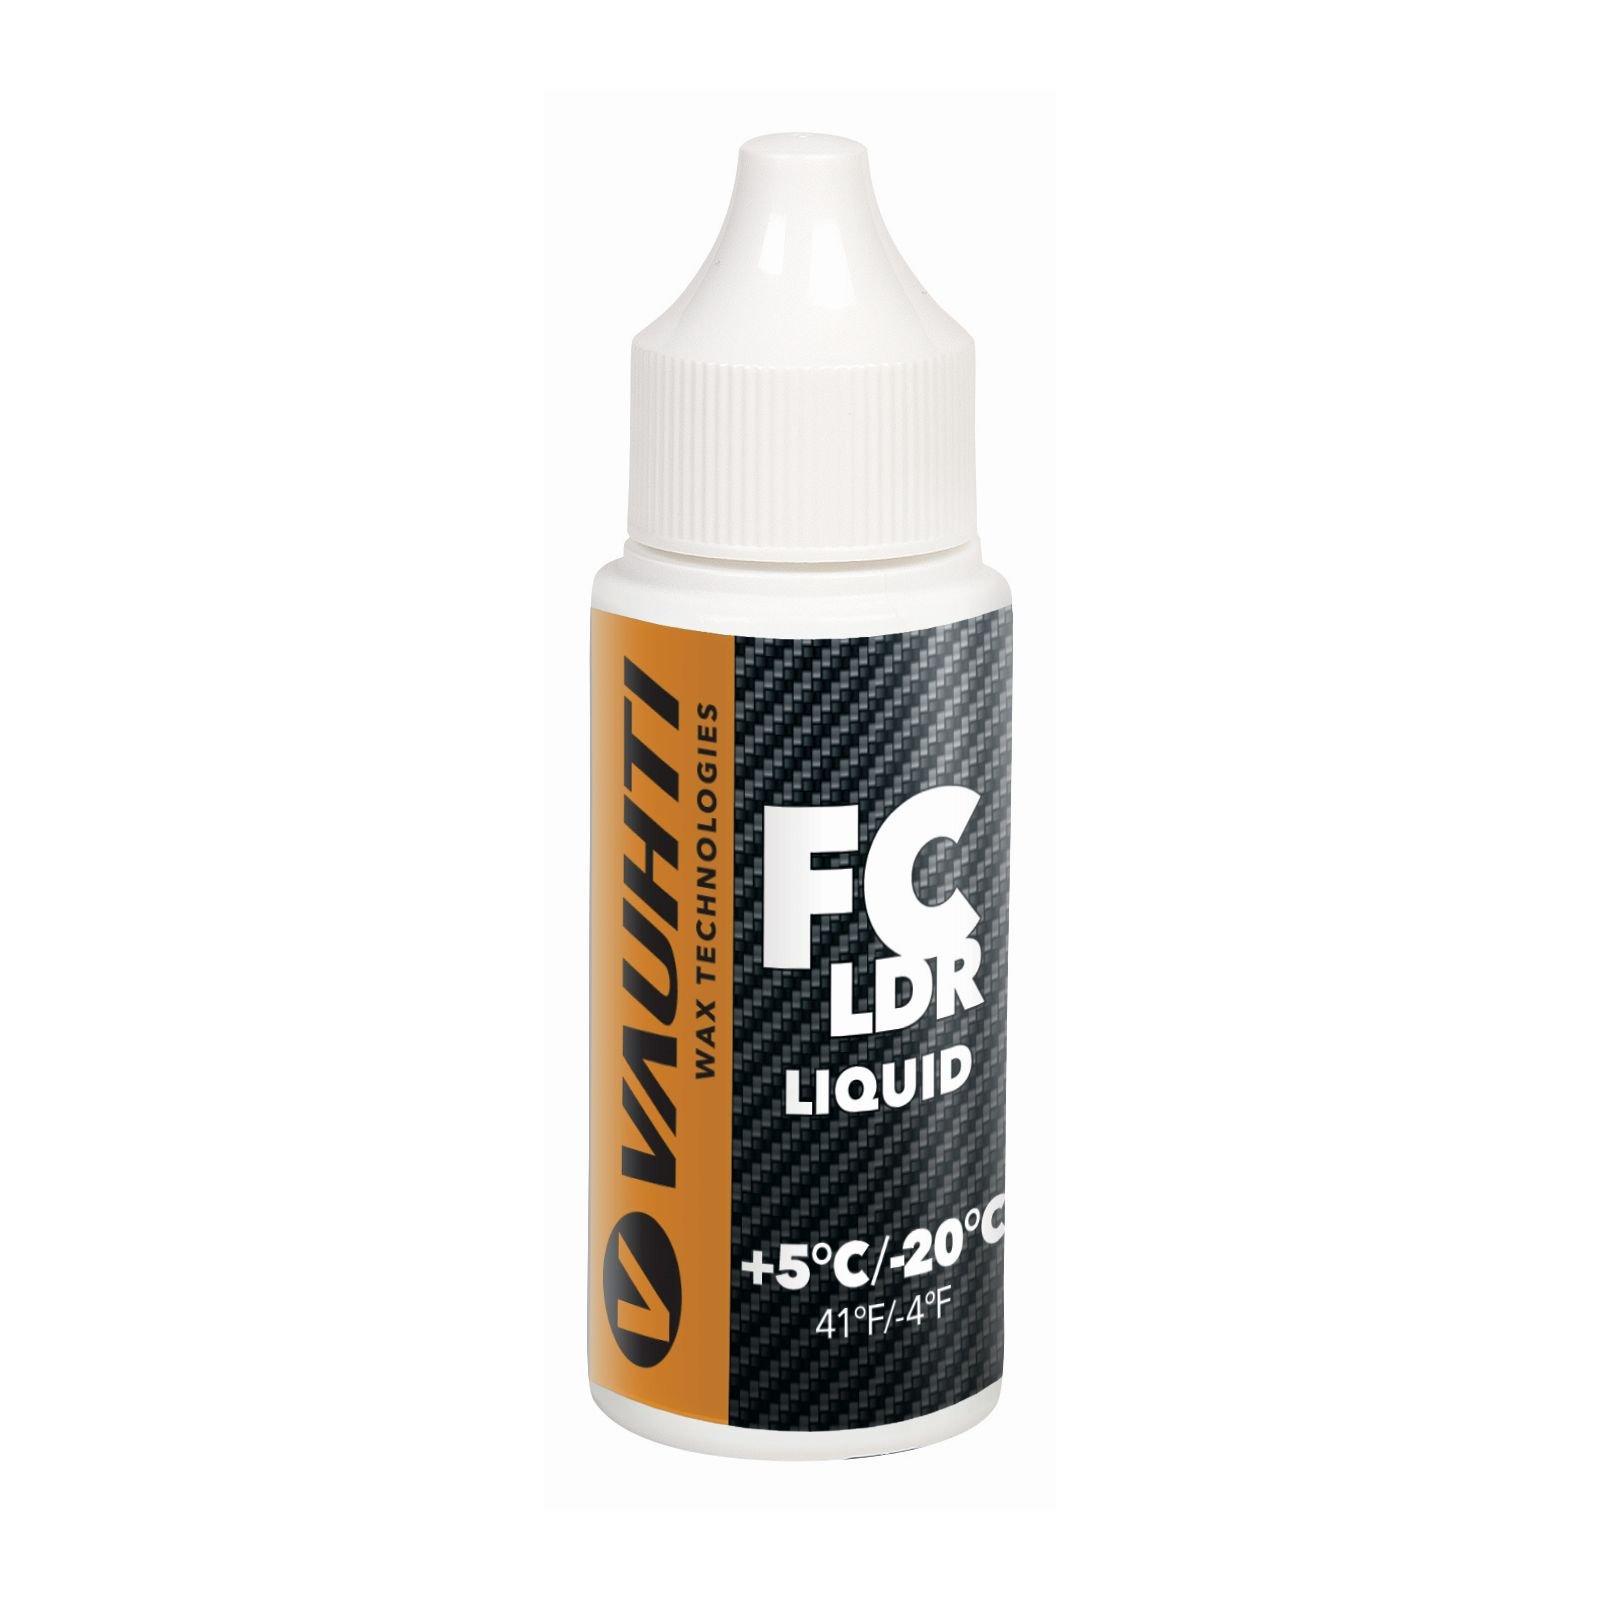 Vauhti FC Fluoro Liquid LDR by Vauhti